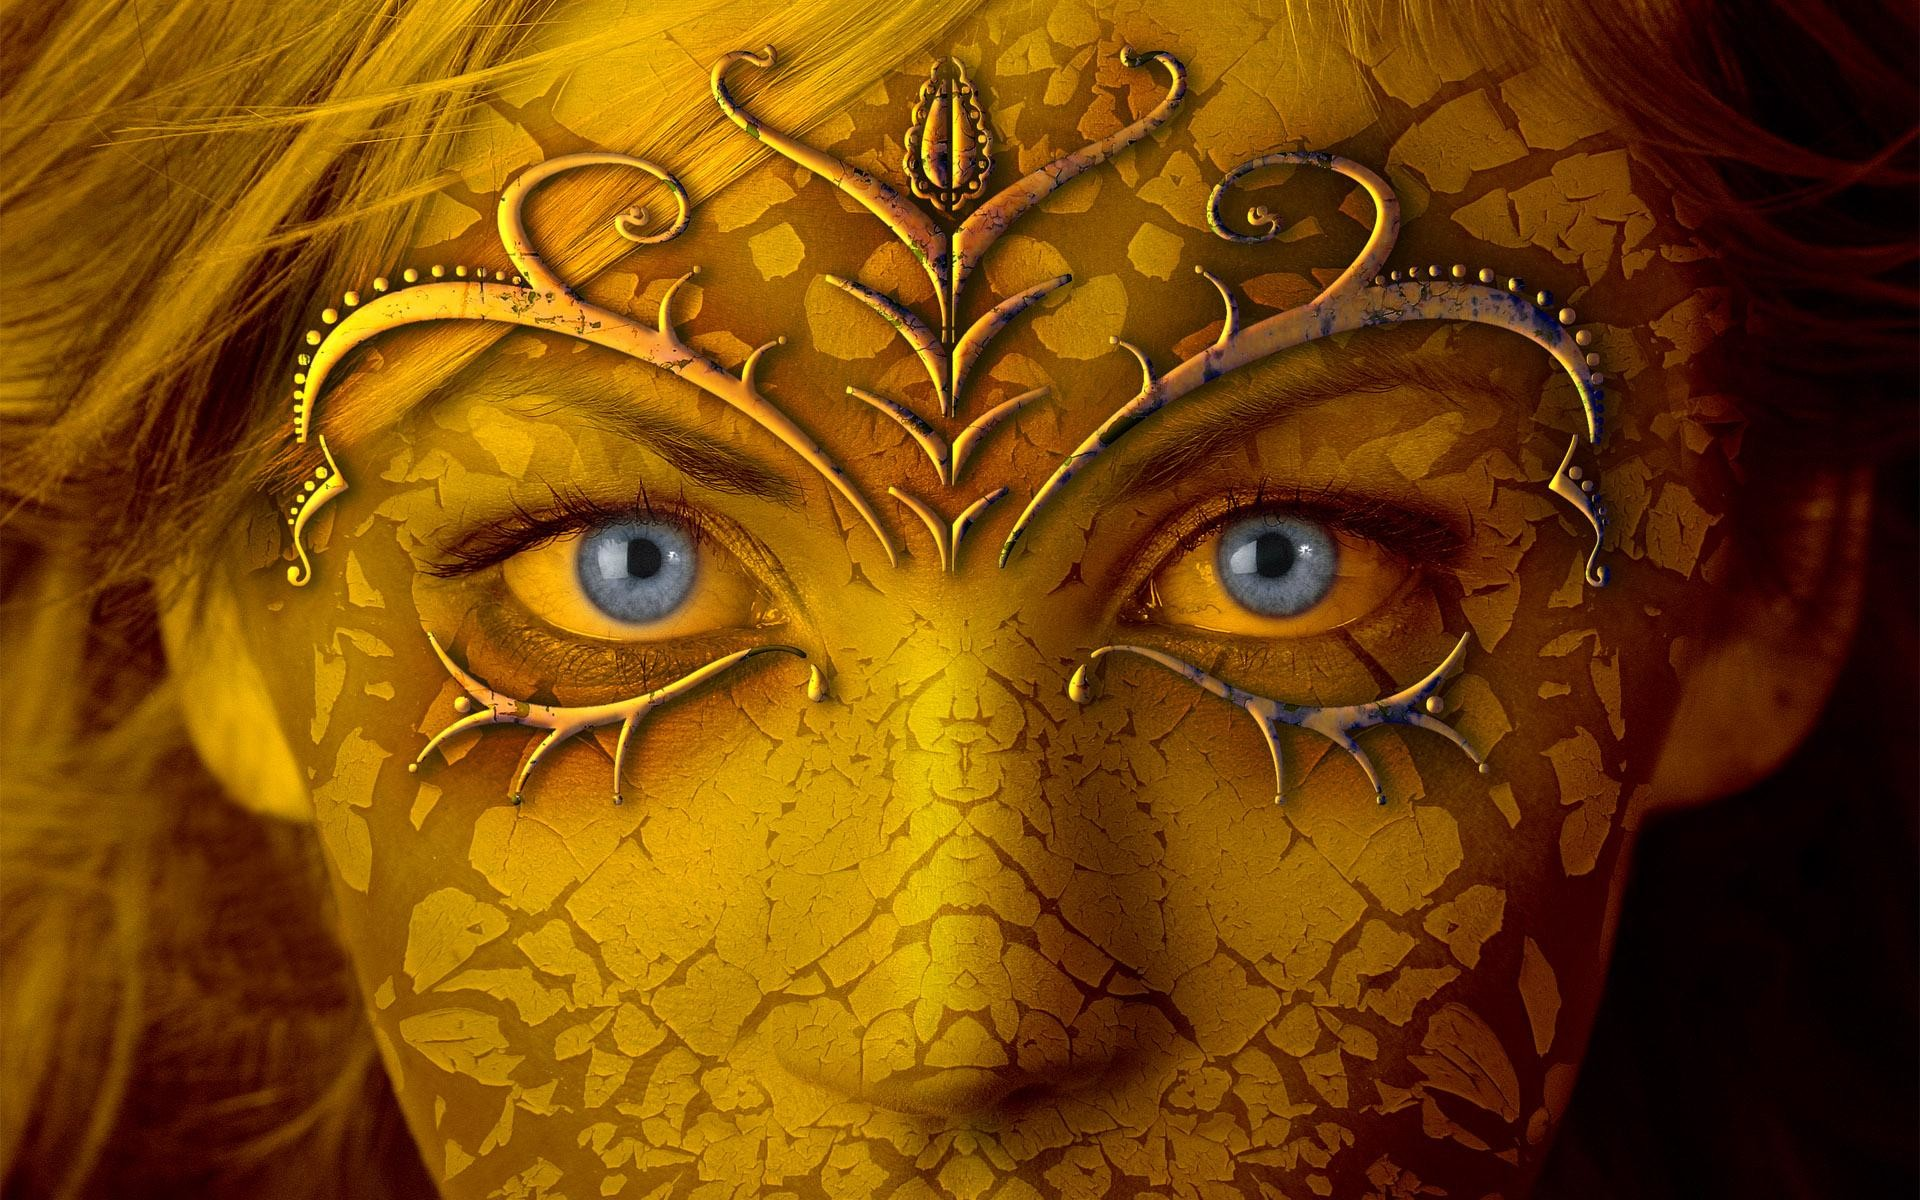 HD Golden Girl With Blue Eyes Wallpaper